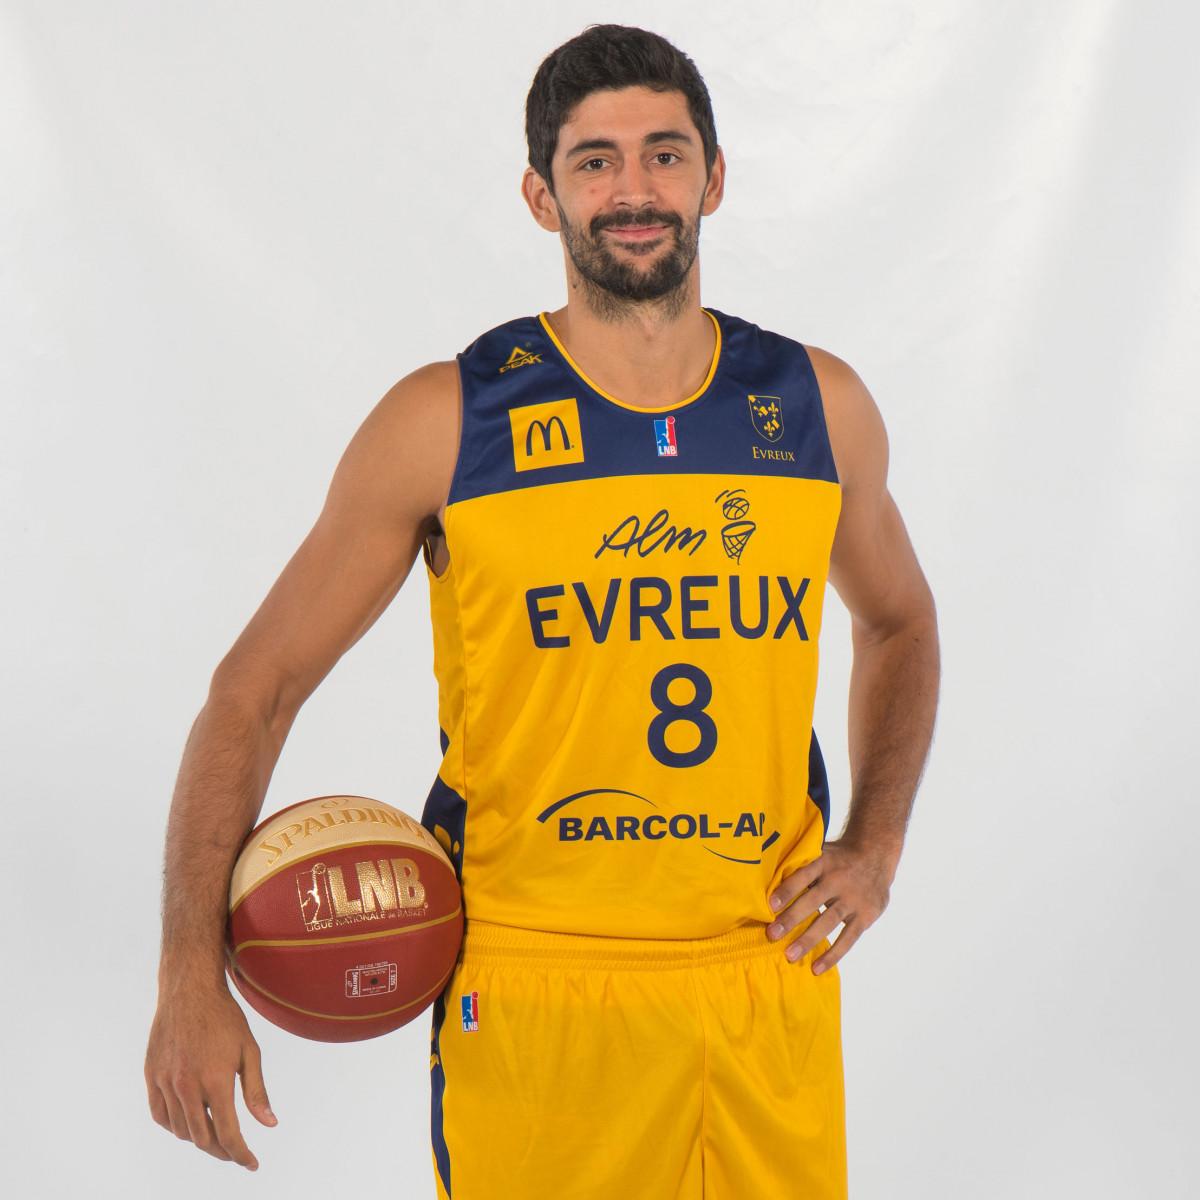 Photo of Florent Tortosa, 2019-2020 season